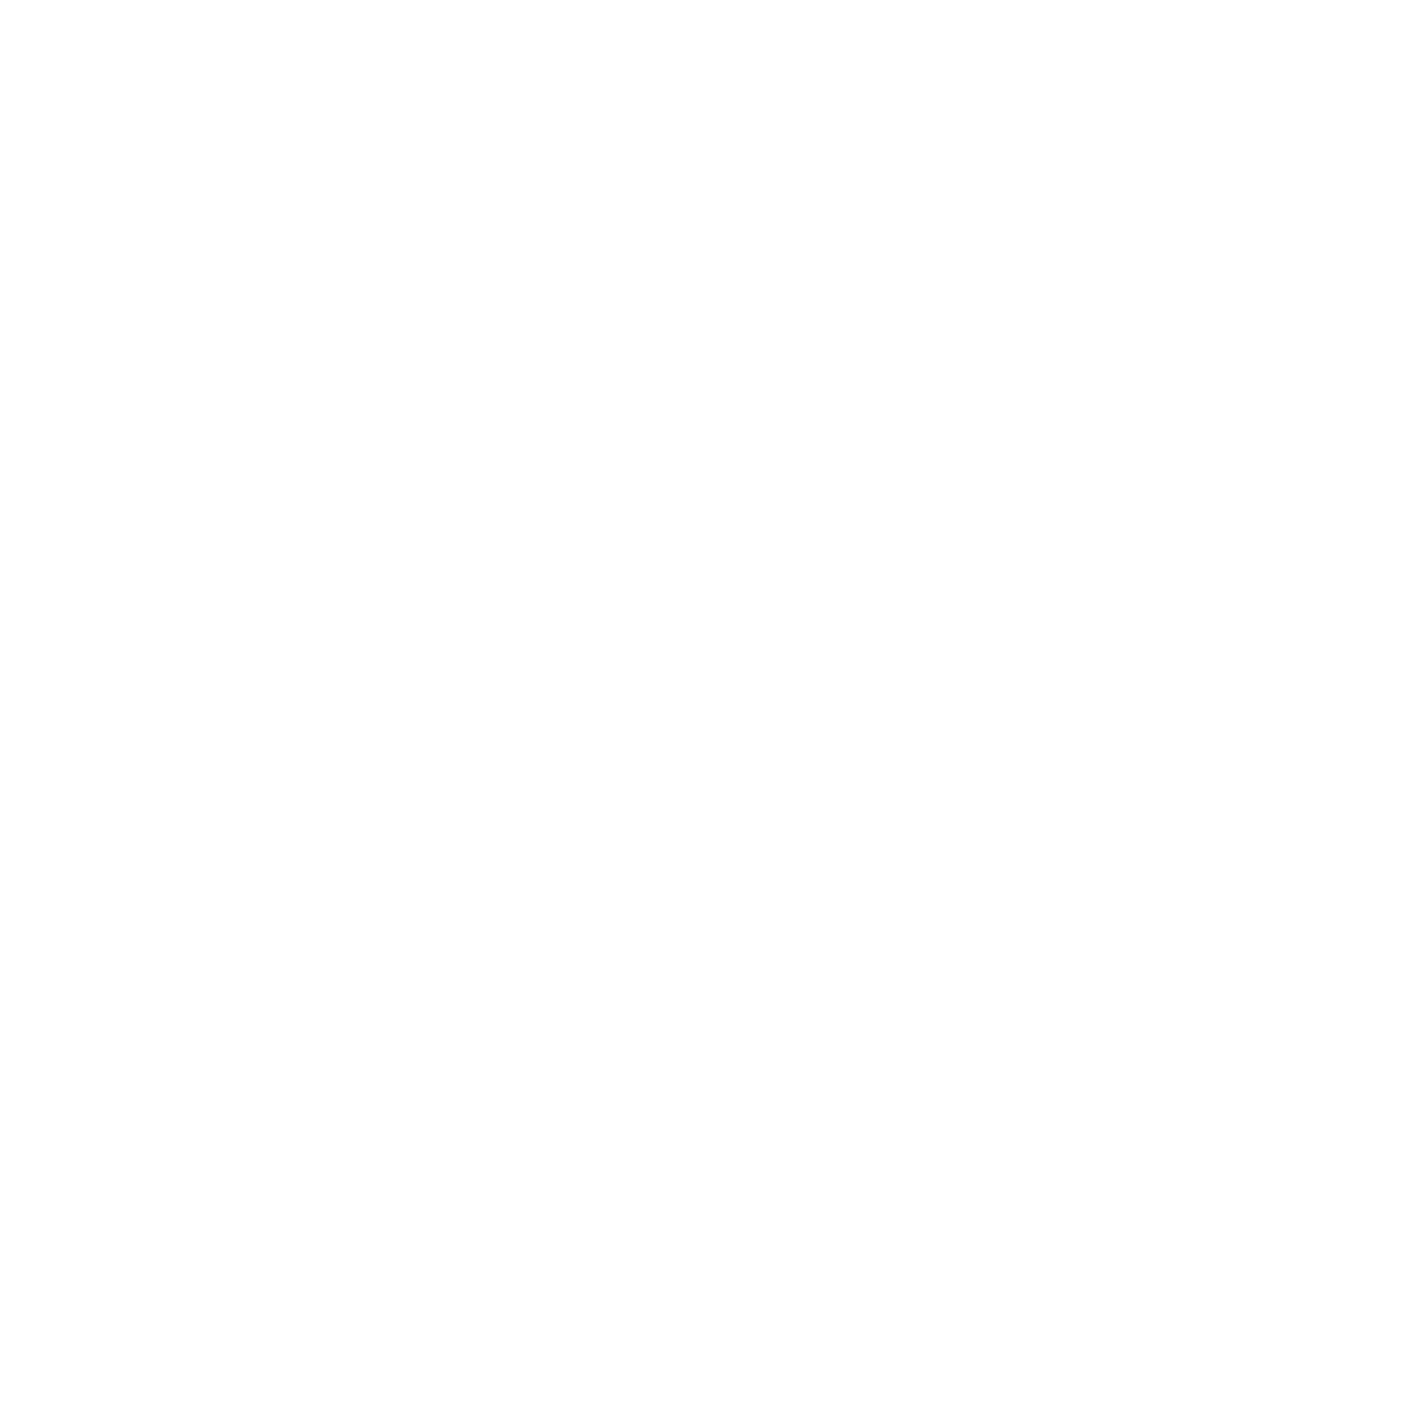 Logo dog white